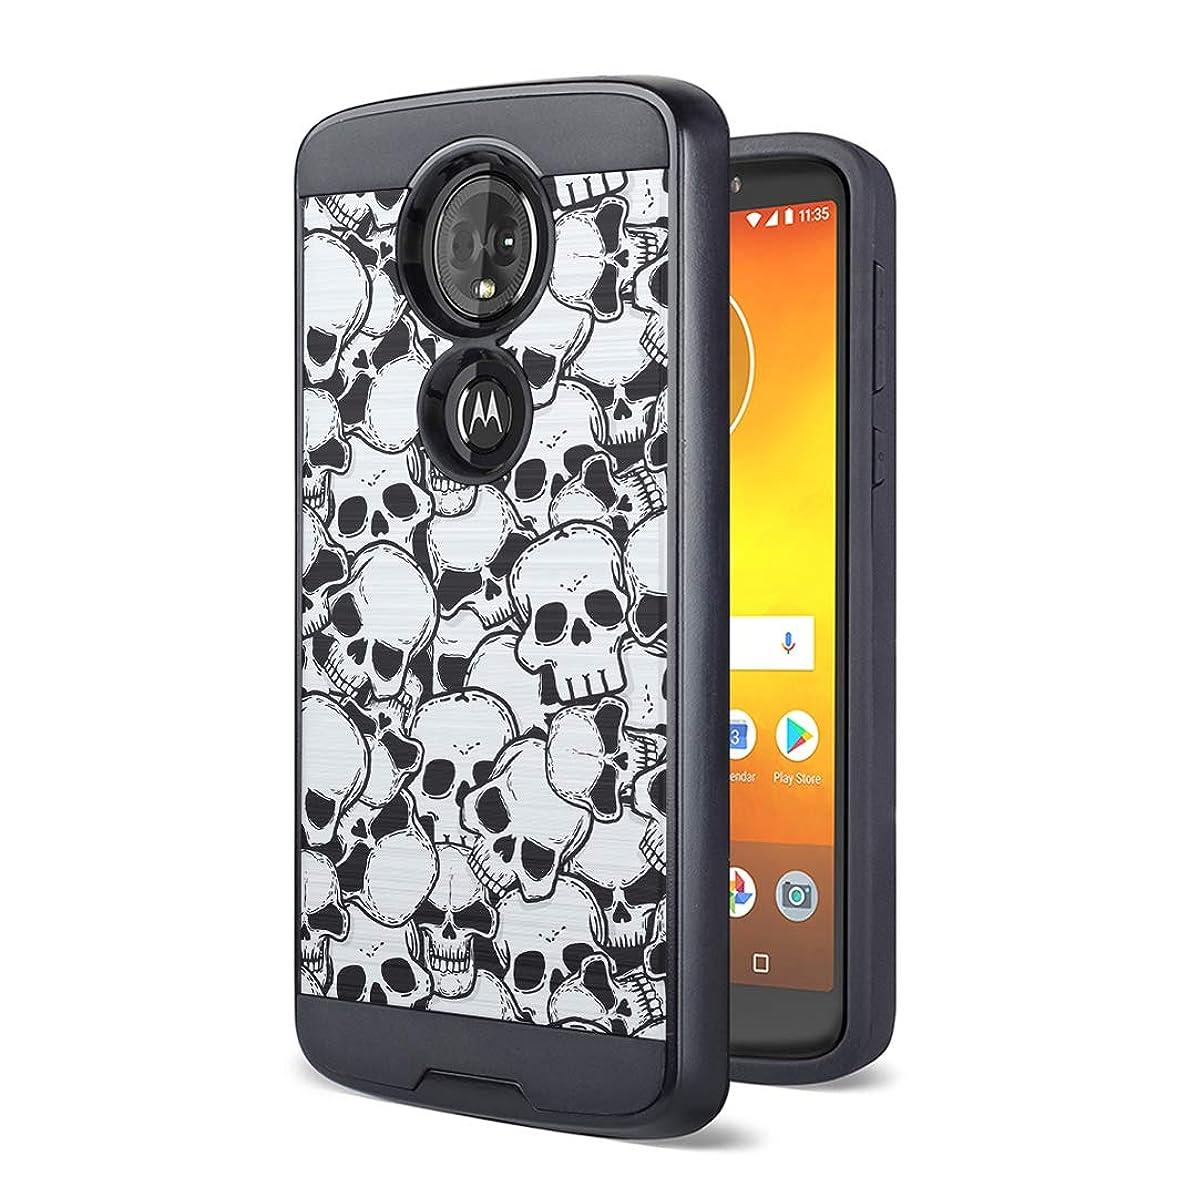 Moriko Case Compatible with Moto G7 Power, Moto G7 Supra [Drop Protection Fusion Dual Layer Slick Armor Case Black] for Motorola Moto G7 Power - (Skull)